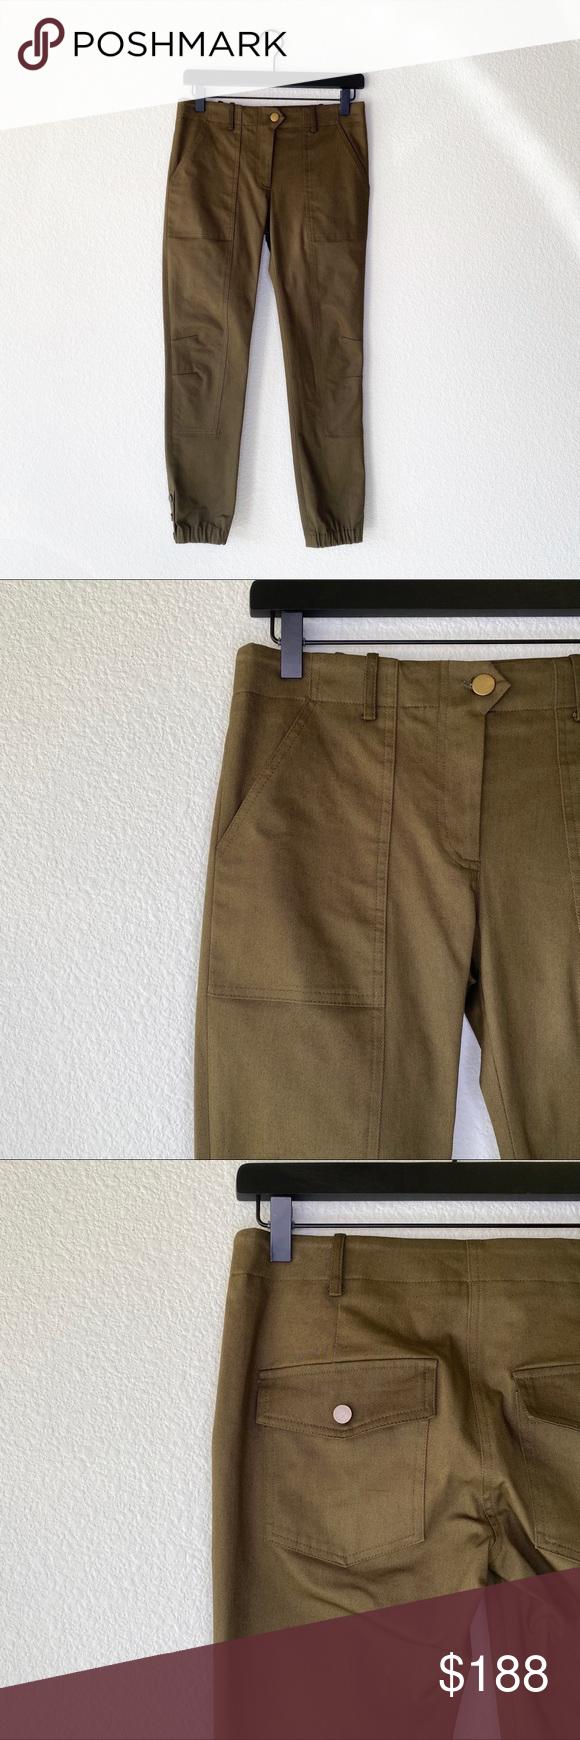 ▪️Veronica Beard▪️Field Cargo Pants Veronica Beard Field Cargo Pants In …